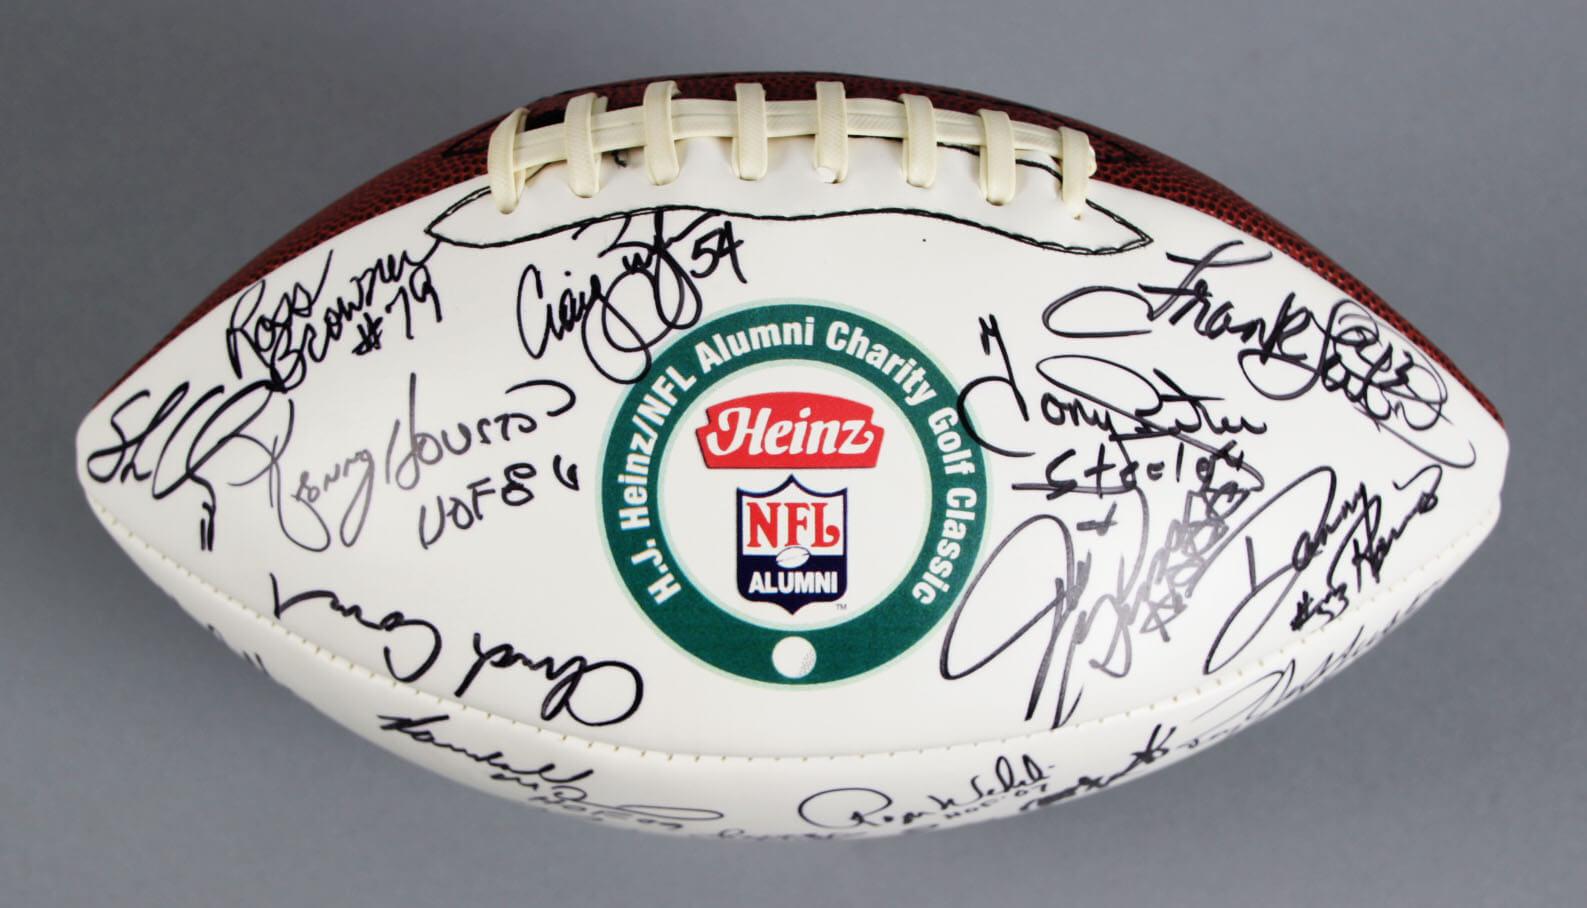 Heinz/NFL Alumni Charity Golf Classic Signed Football L.C. Greenwood,Lynn Swann - JSA